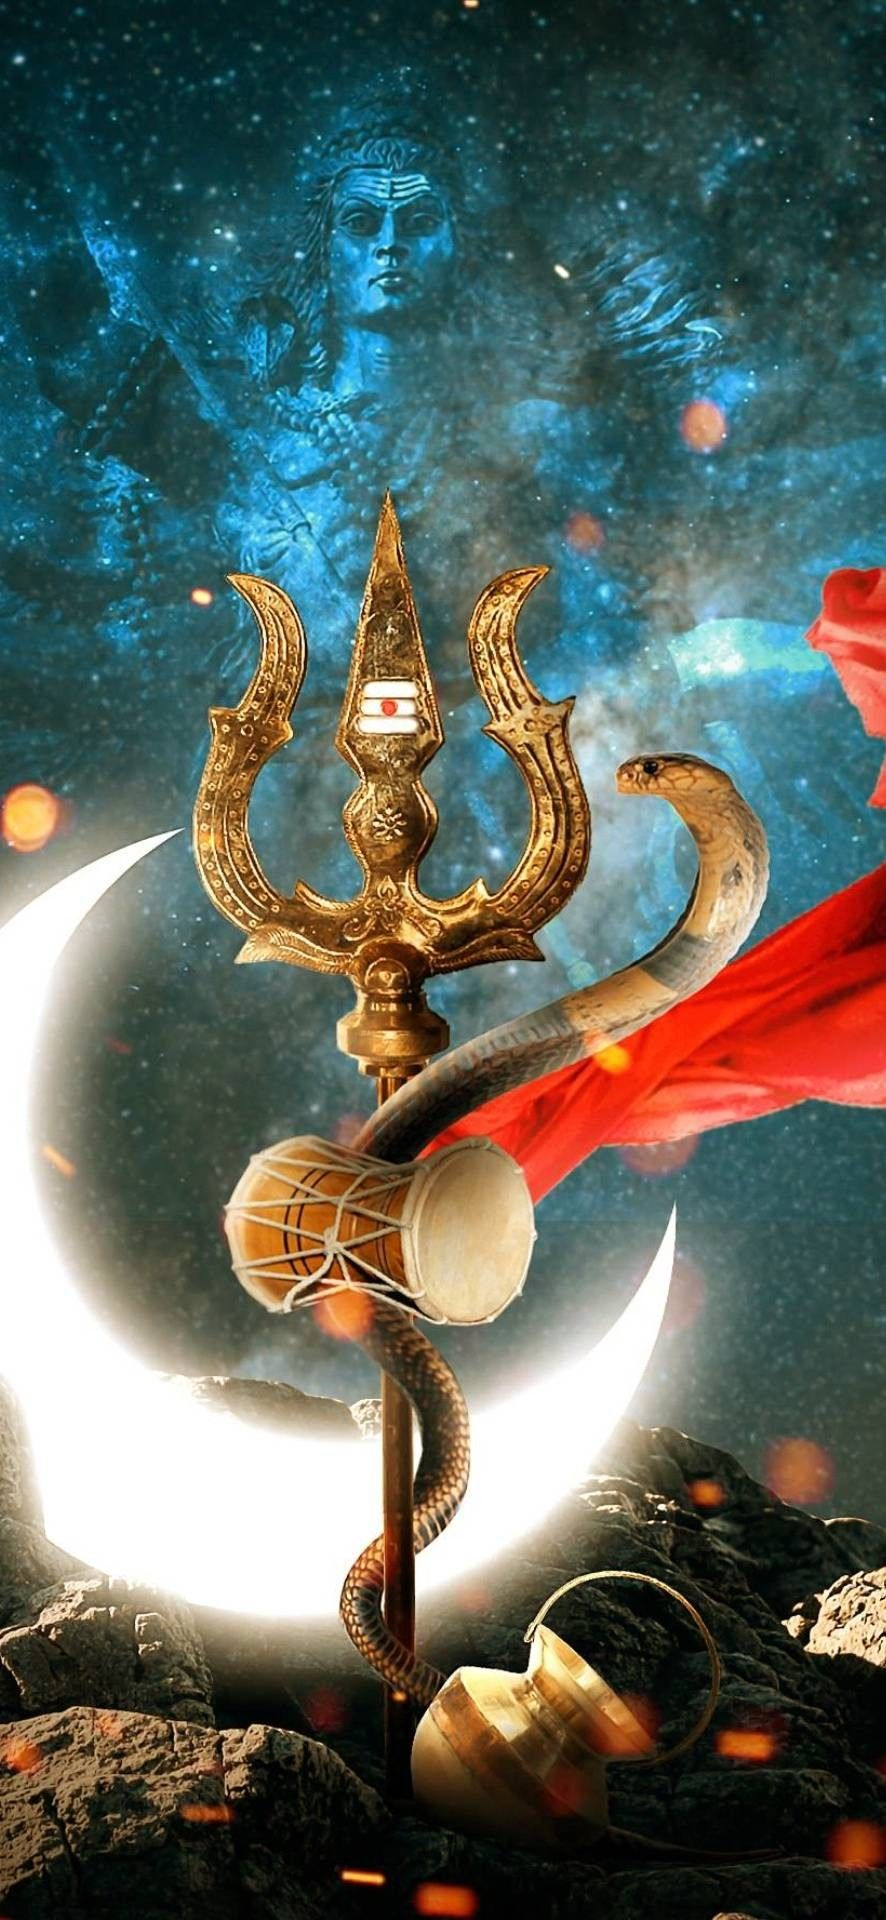 Lord Shiva Amoled 4k Wallpapers - Wallpaper Cave